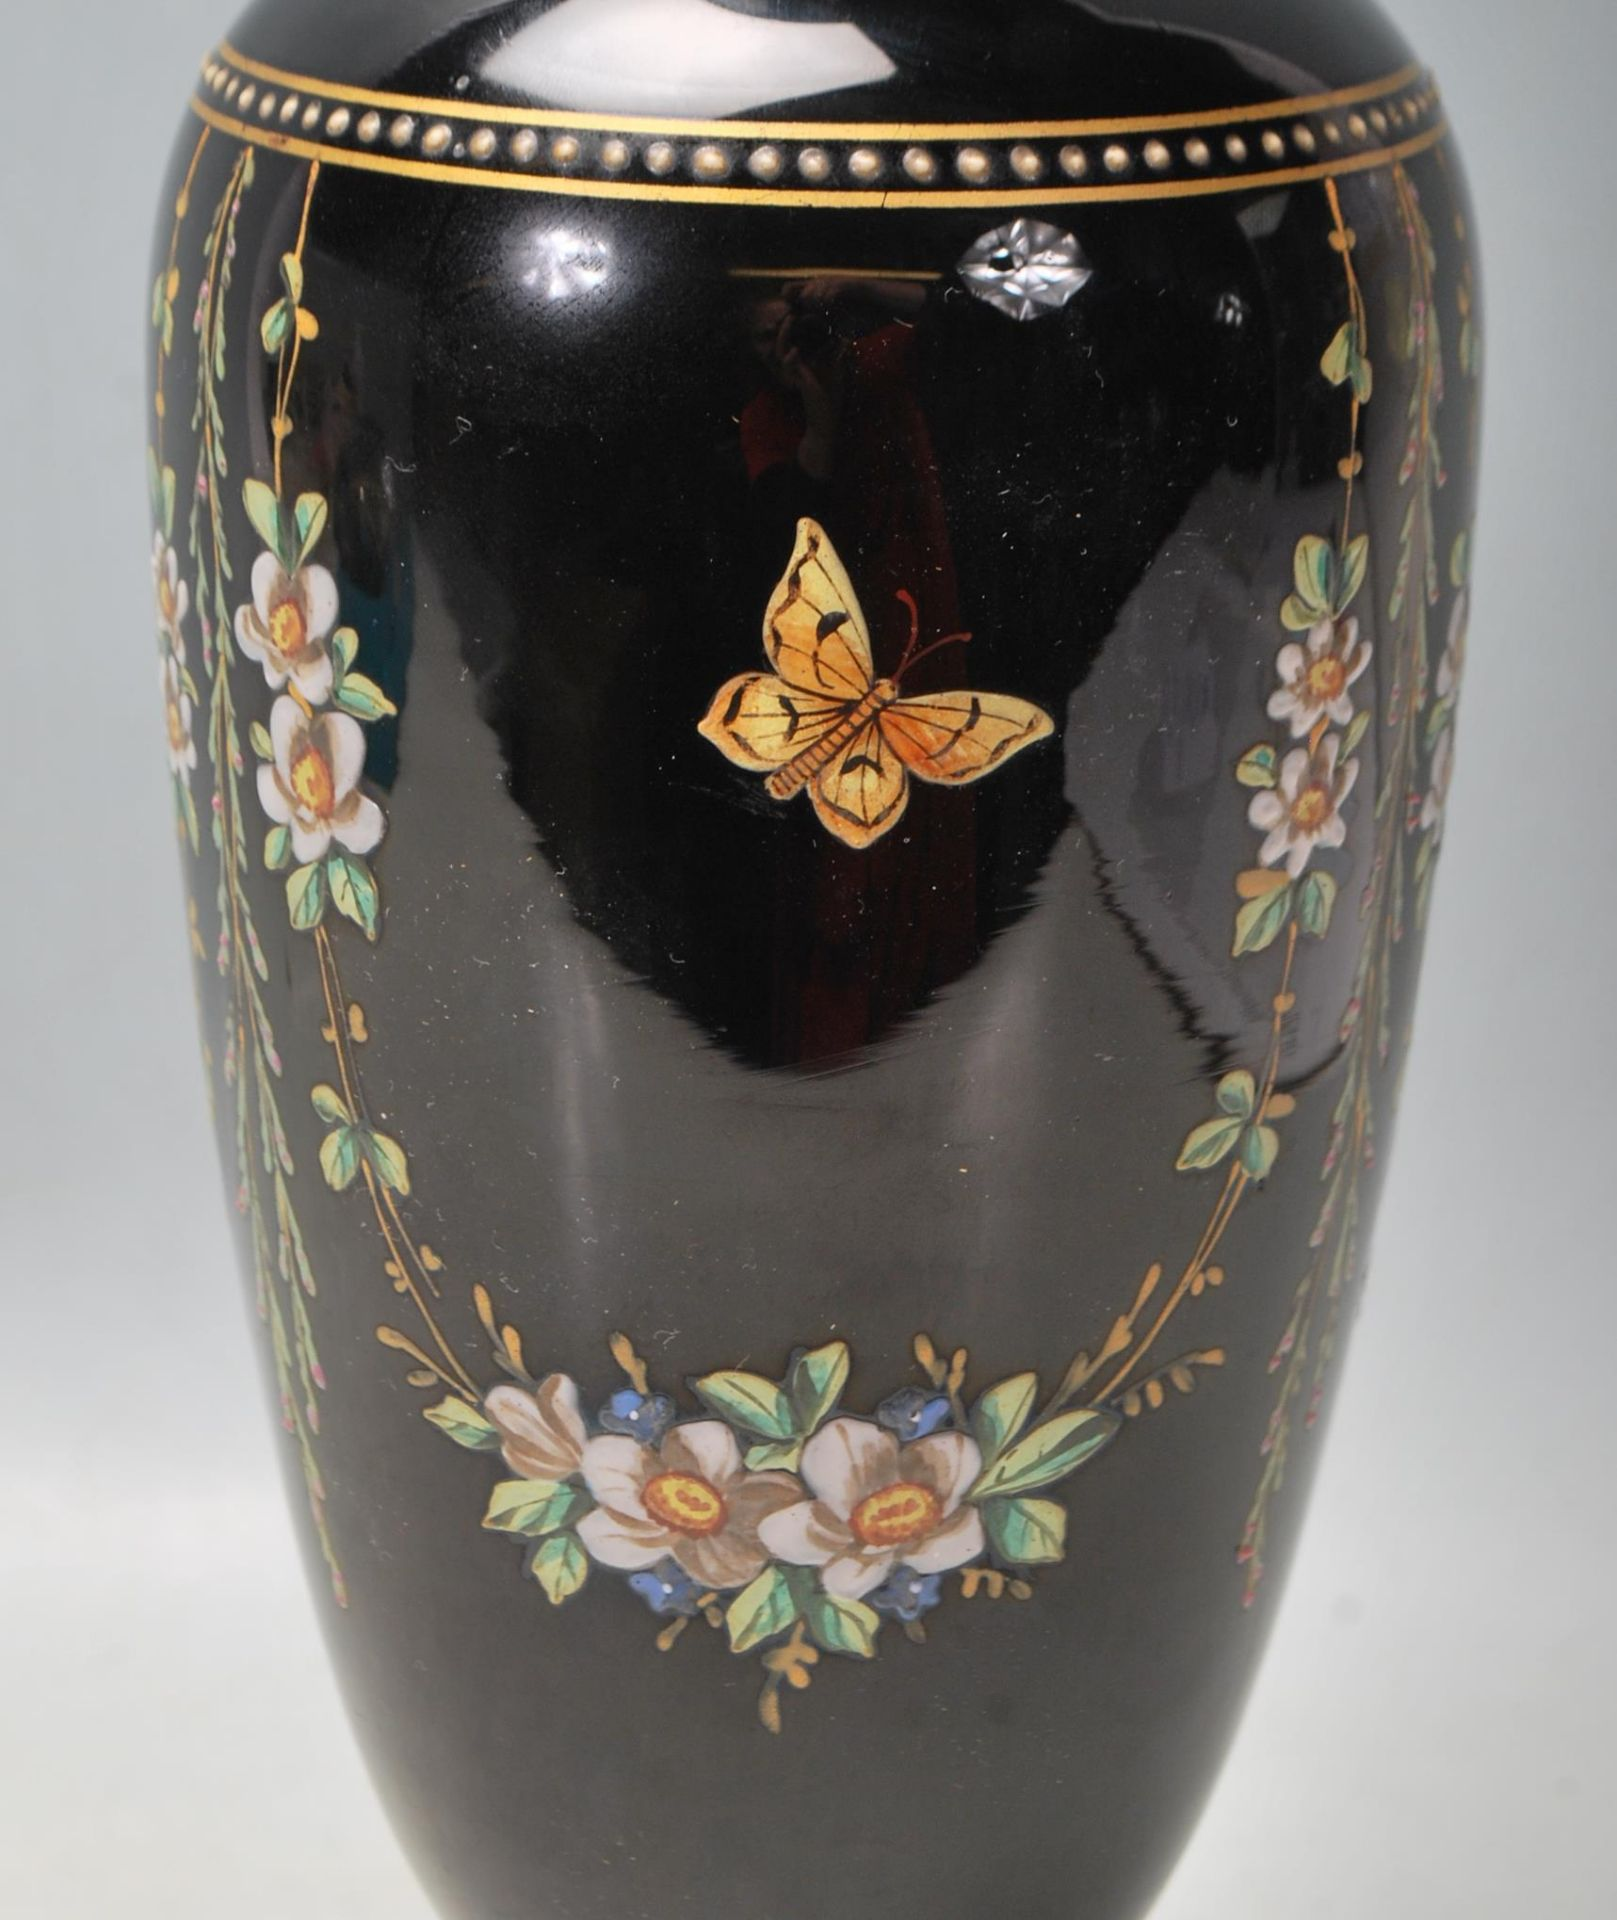 ANTIQUE BLACK AMETHYST BOHEMIAN GLASS VASE - Image 3 of 7